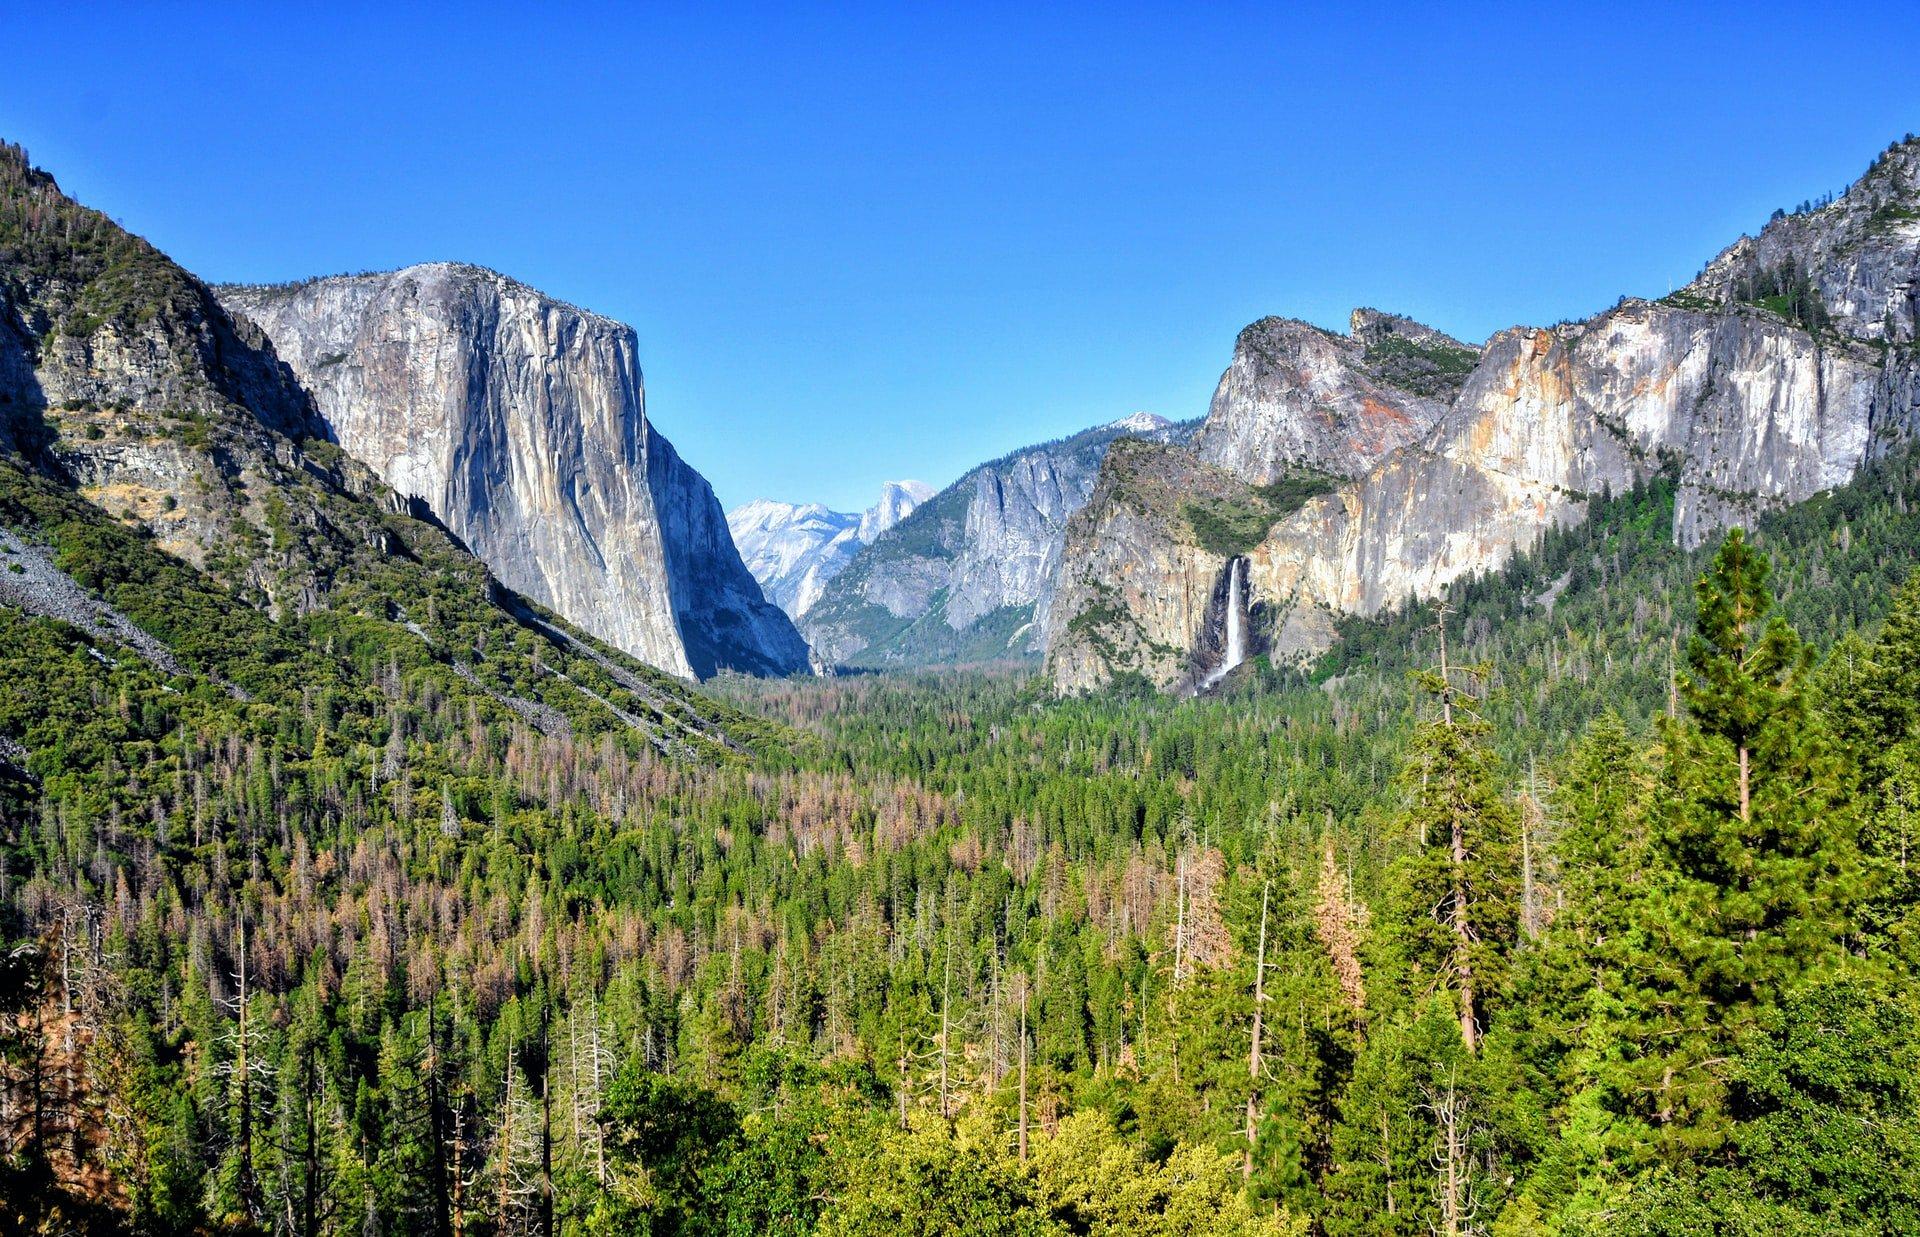 Tunnel View at Yosemite National Park (photo: Anukrati Omar)